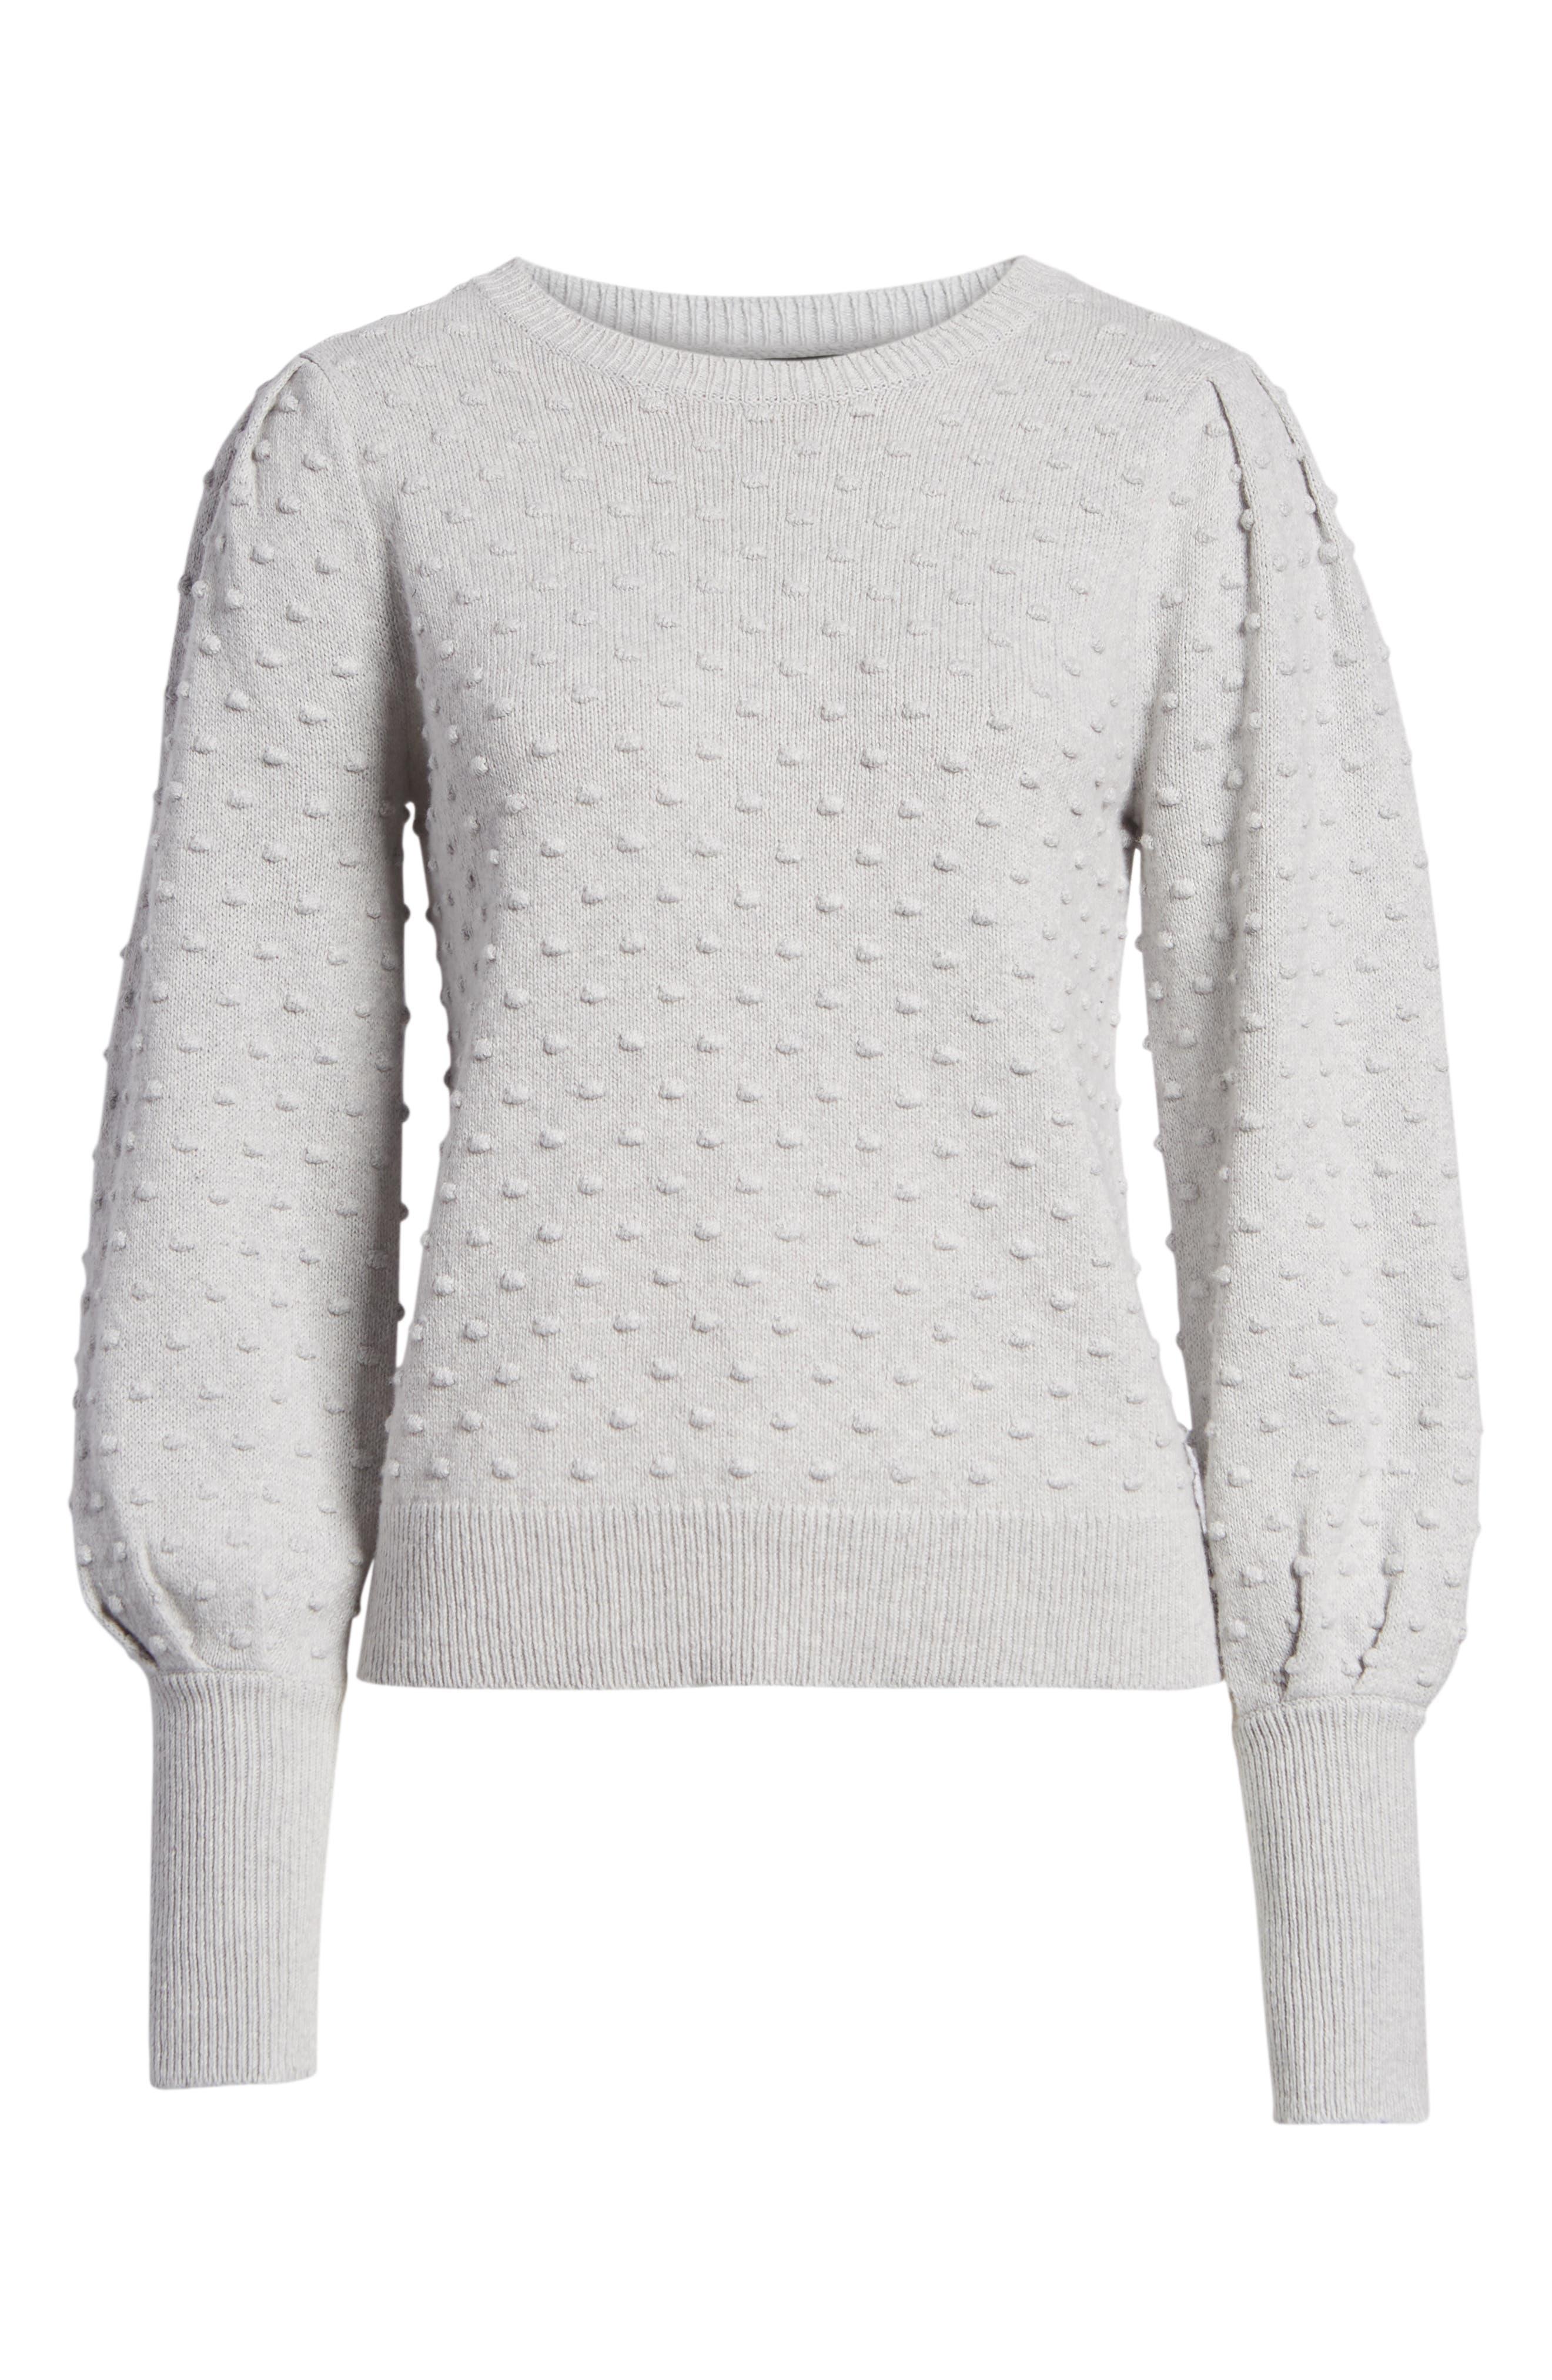 Bobble Stitch Sweater,                             Alternate thumbnail 6, color,                             GREY LIGHT HEATHER